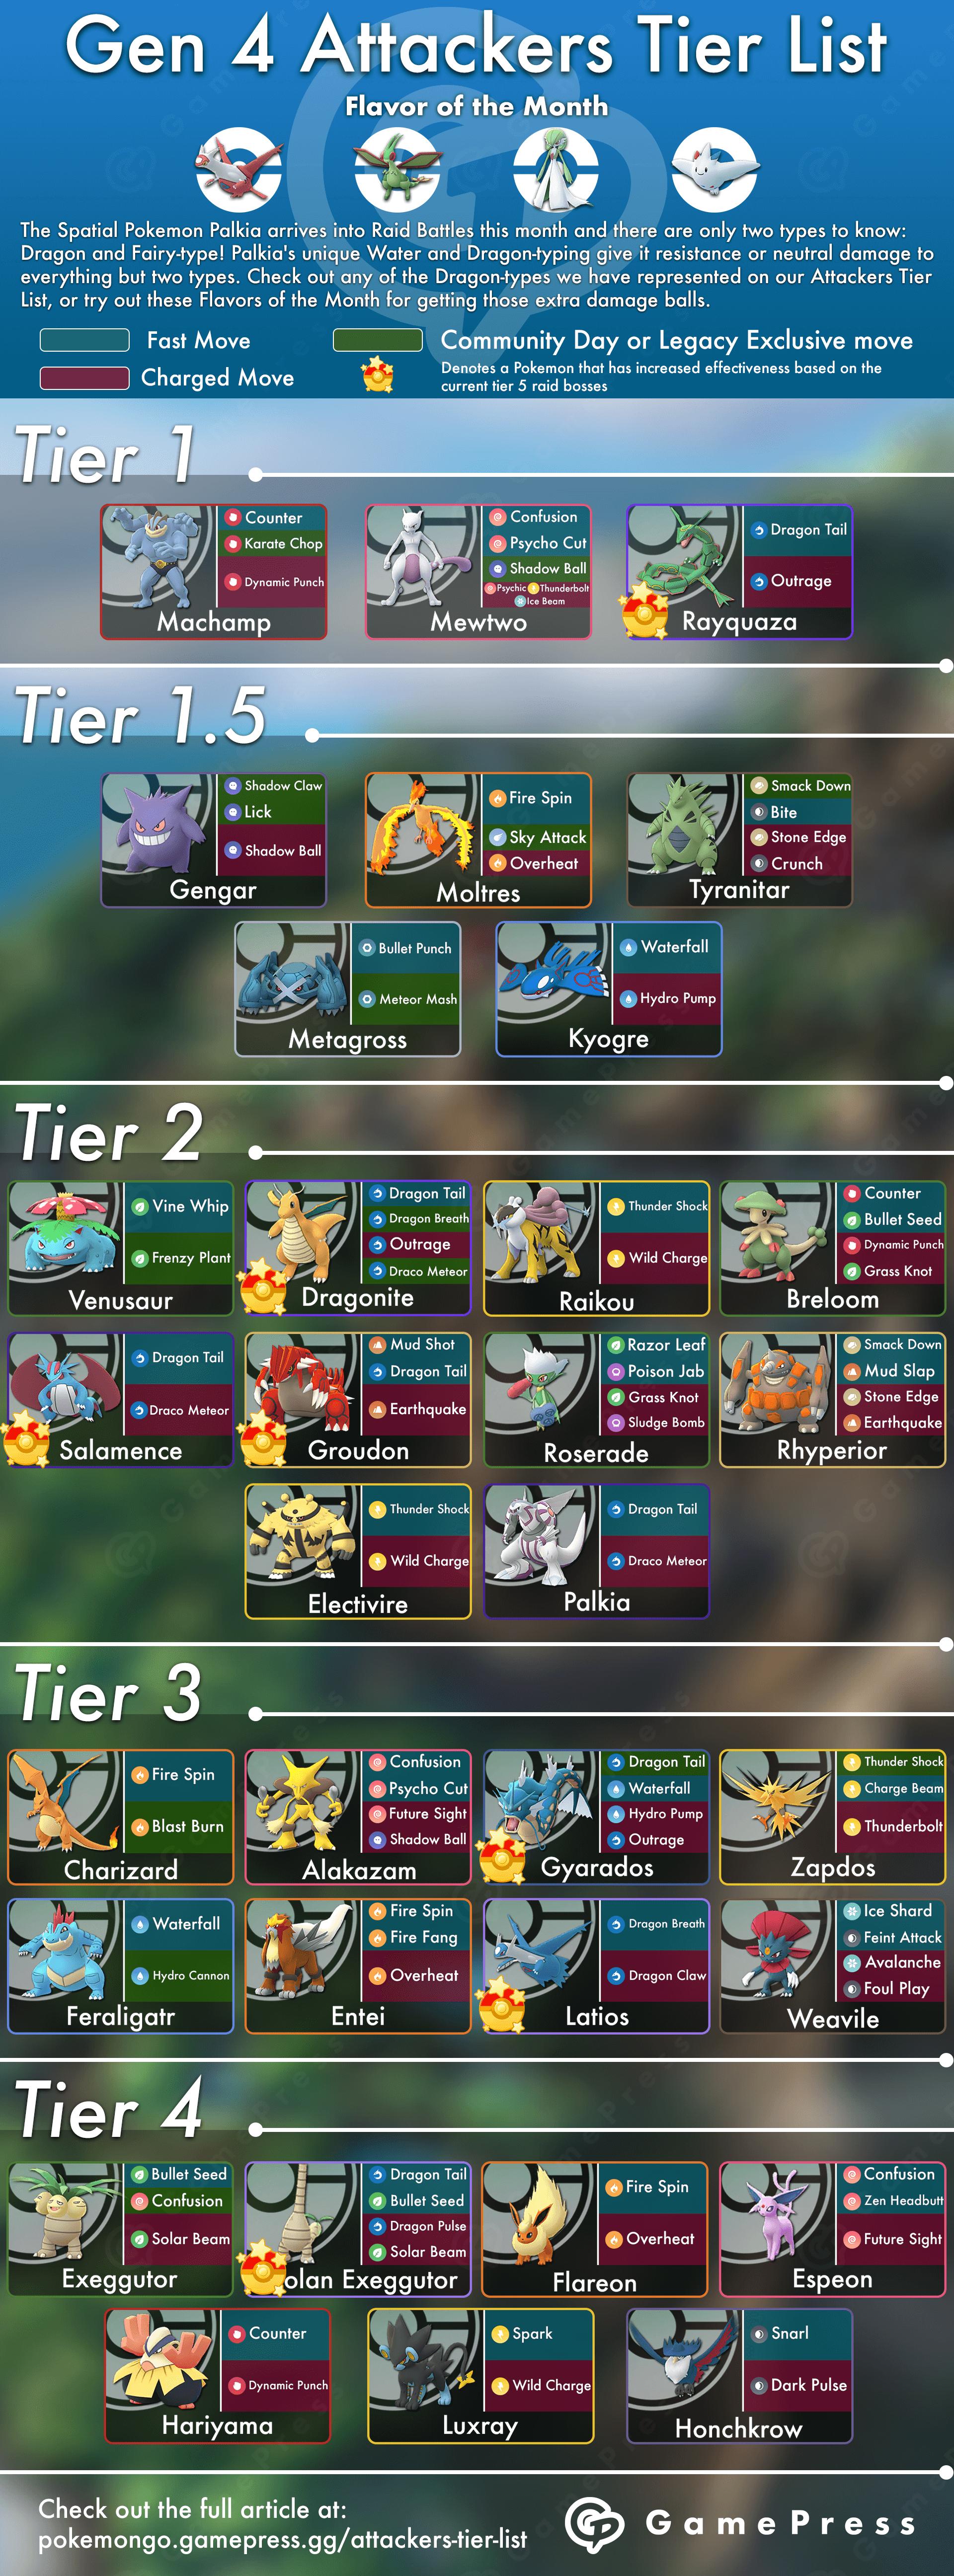 Attackers Tier List | Pokemon GO Wiki - GamePress | Pokemon